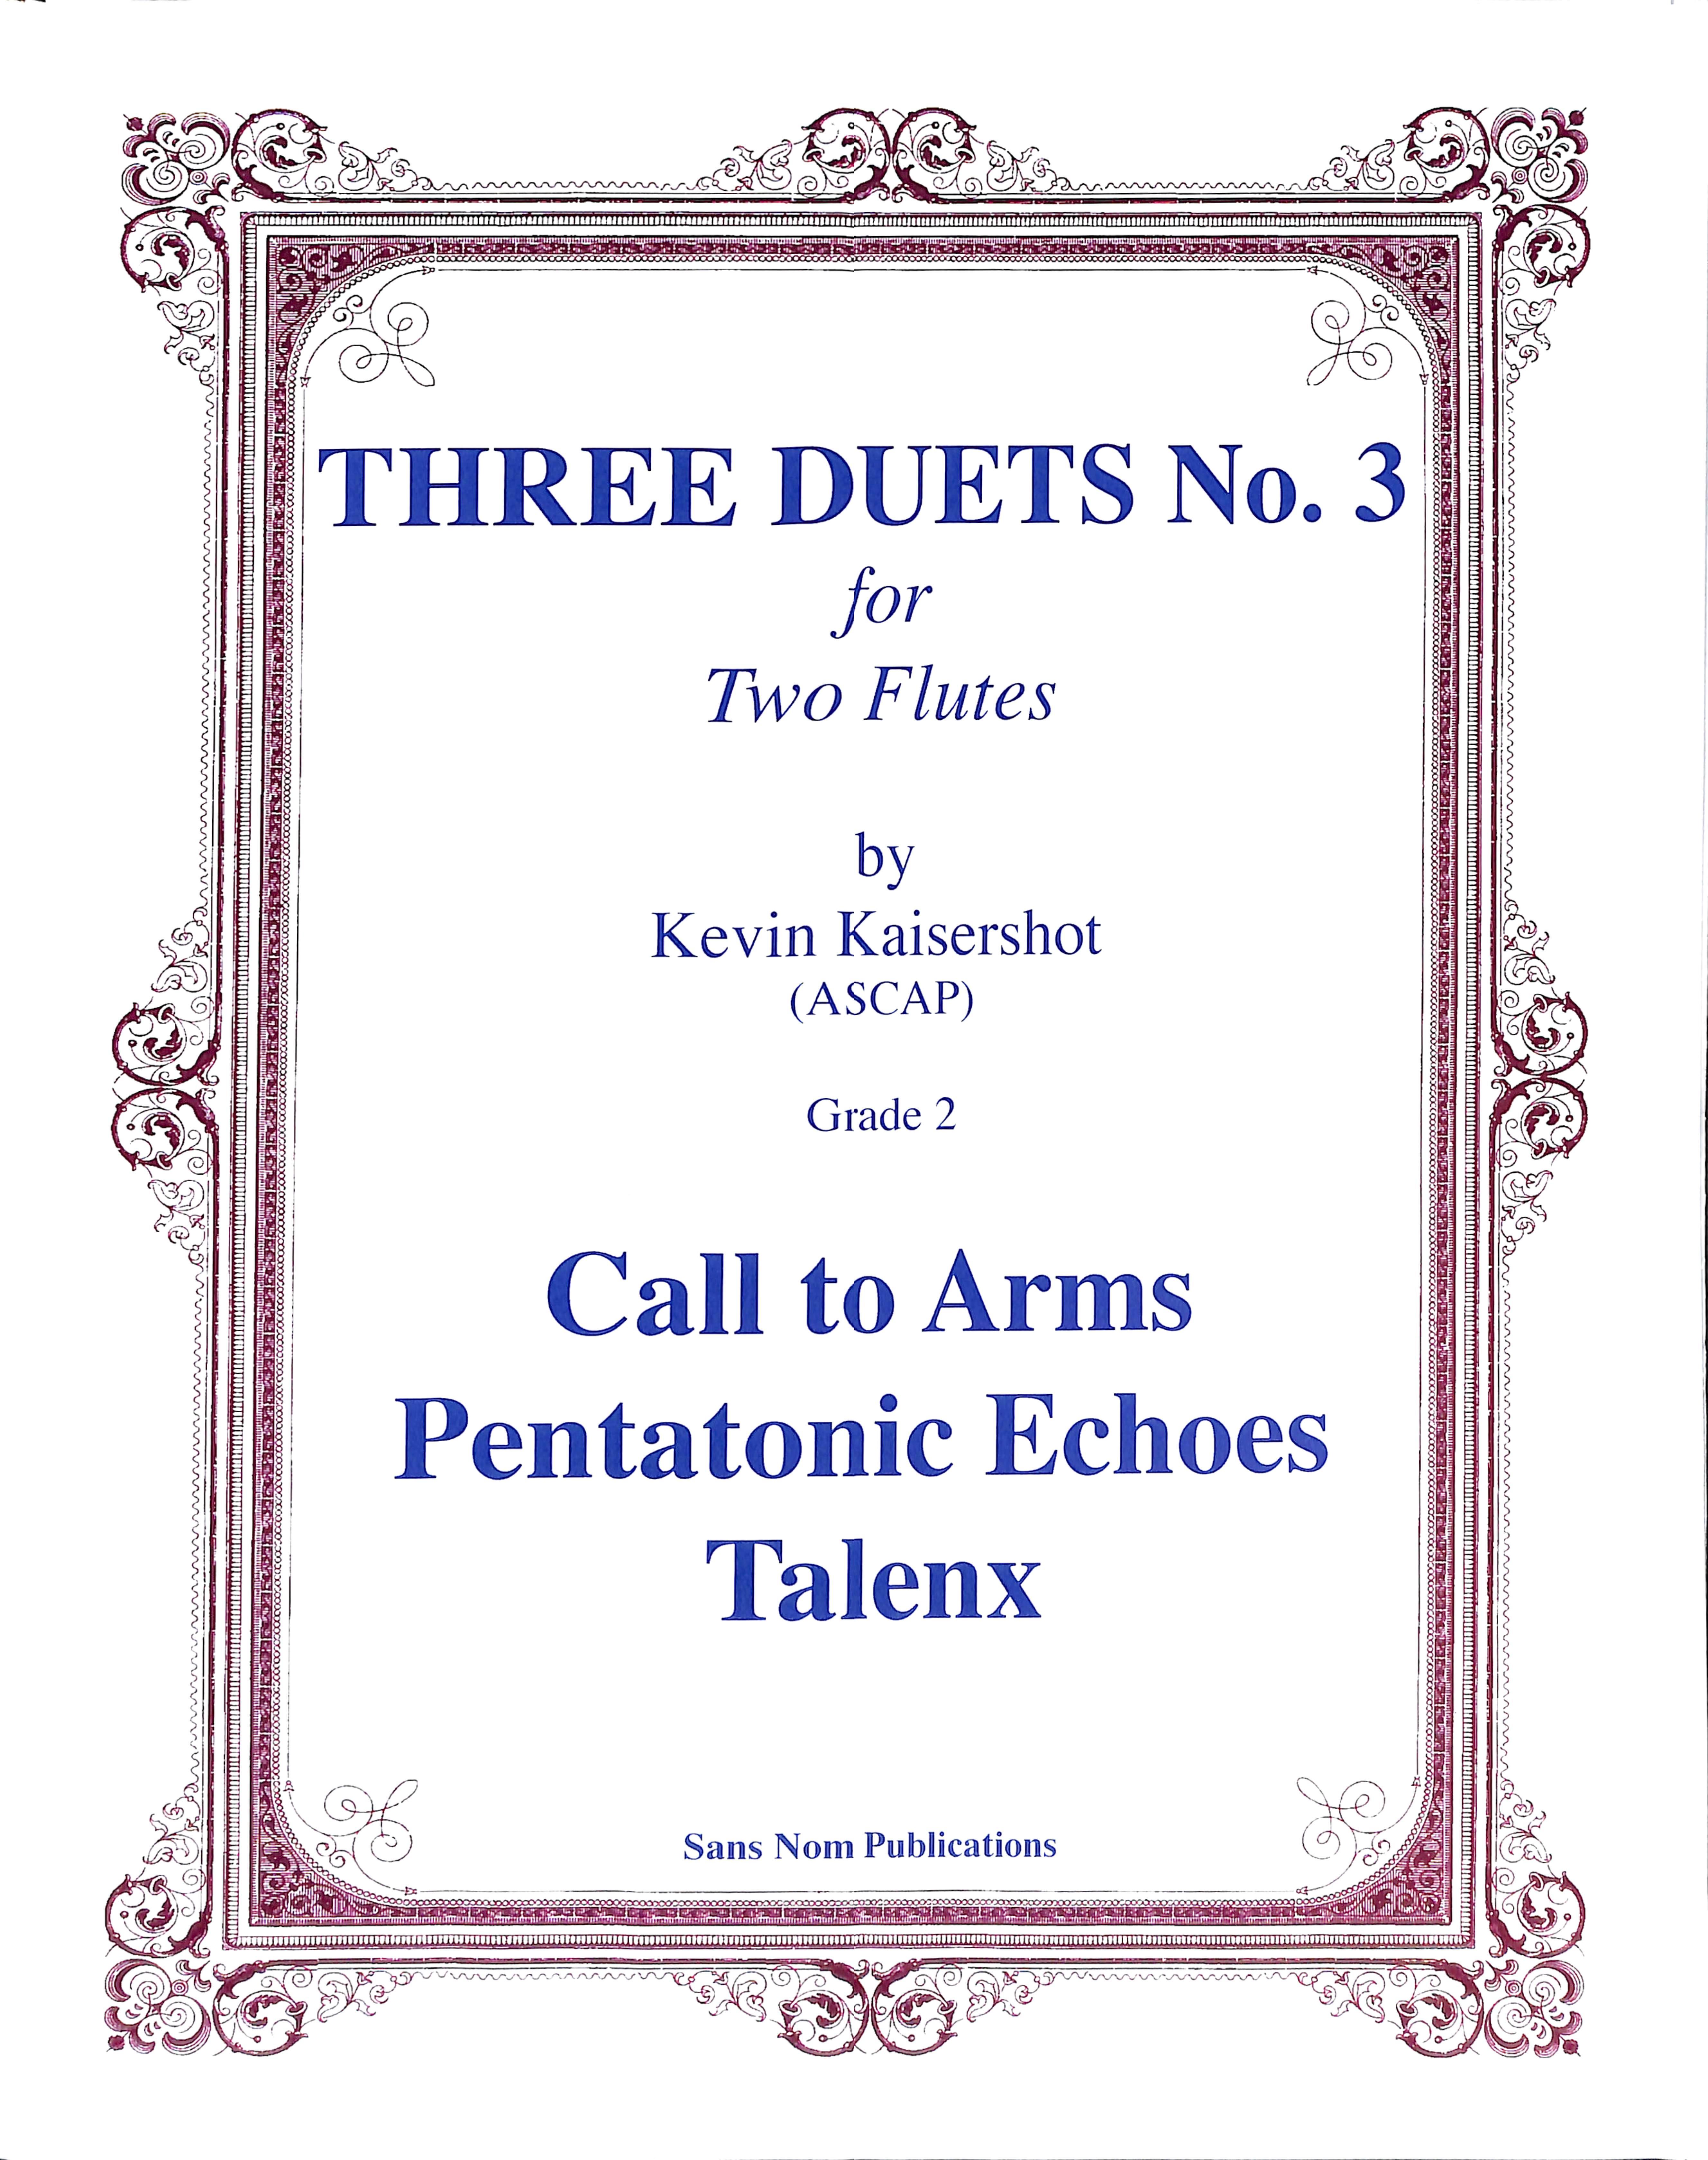 Three Duets #3 Thumbnail